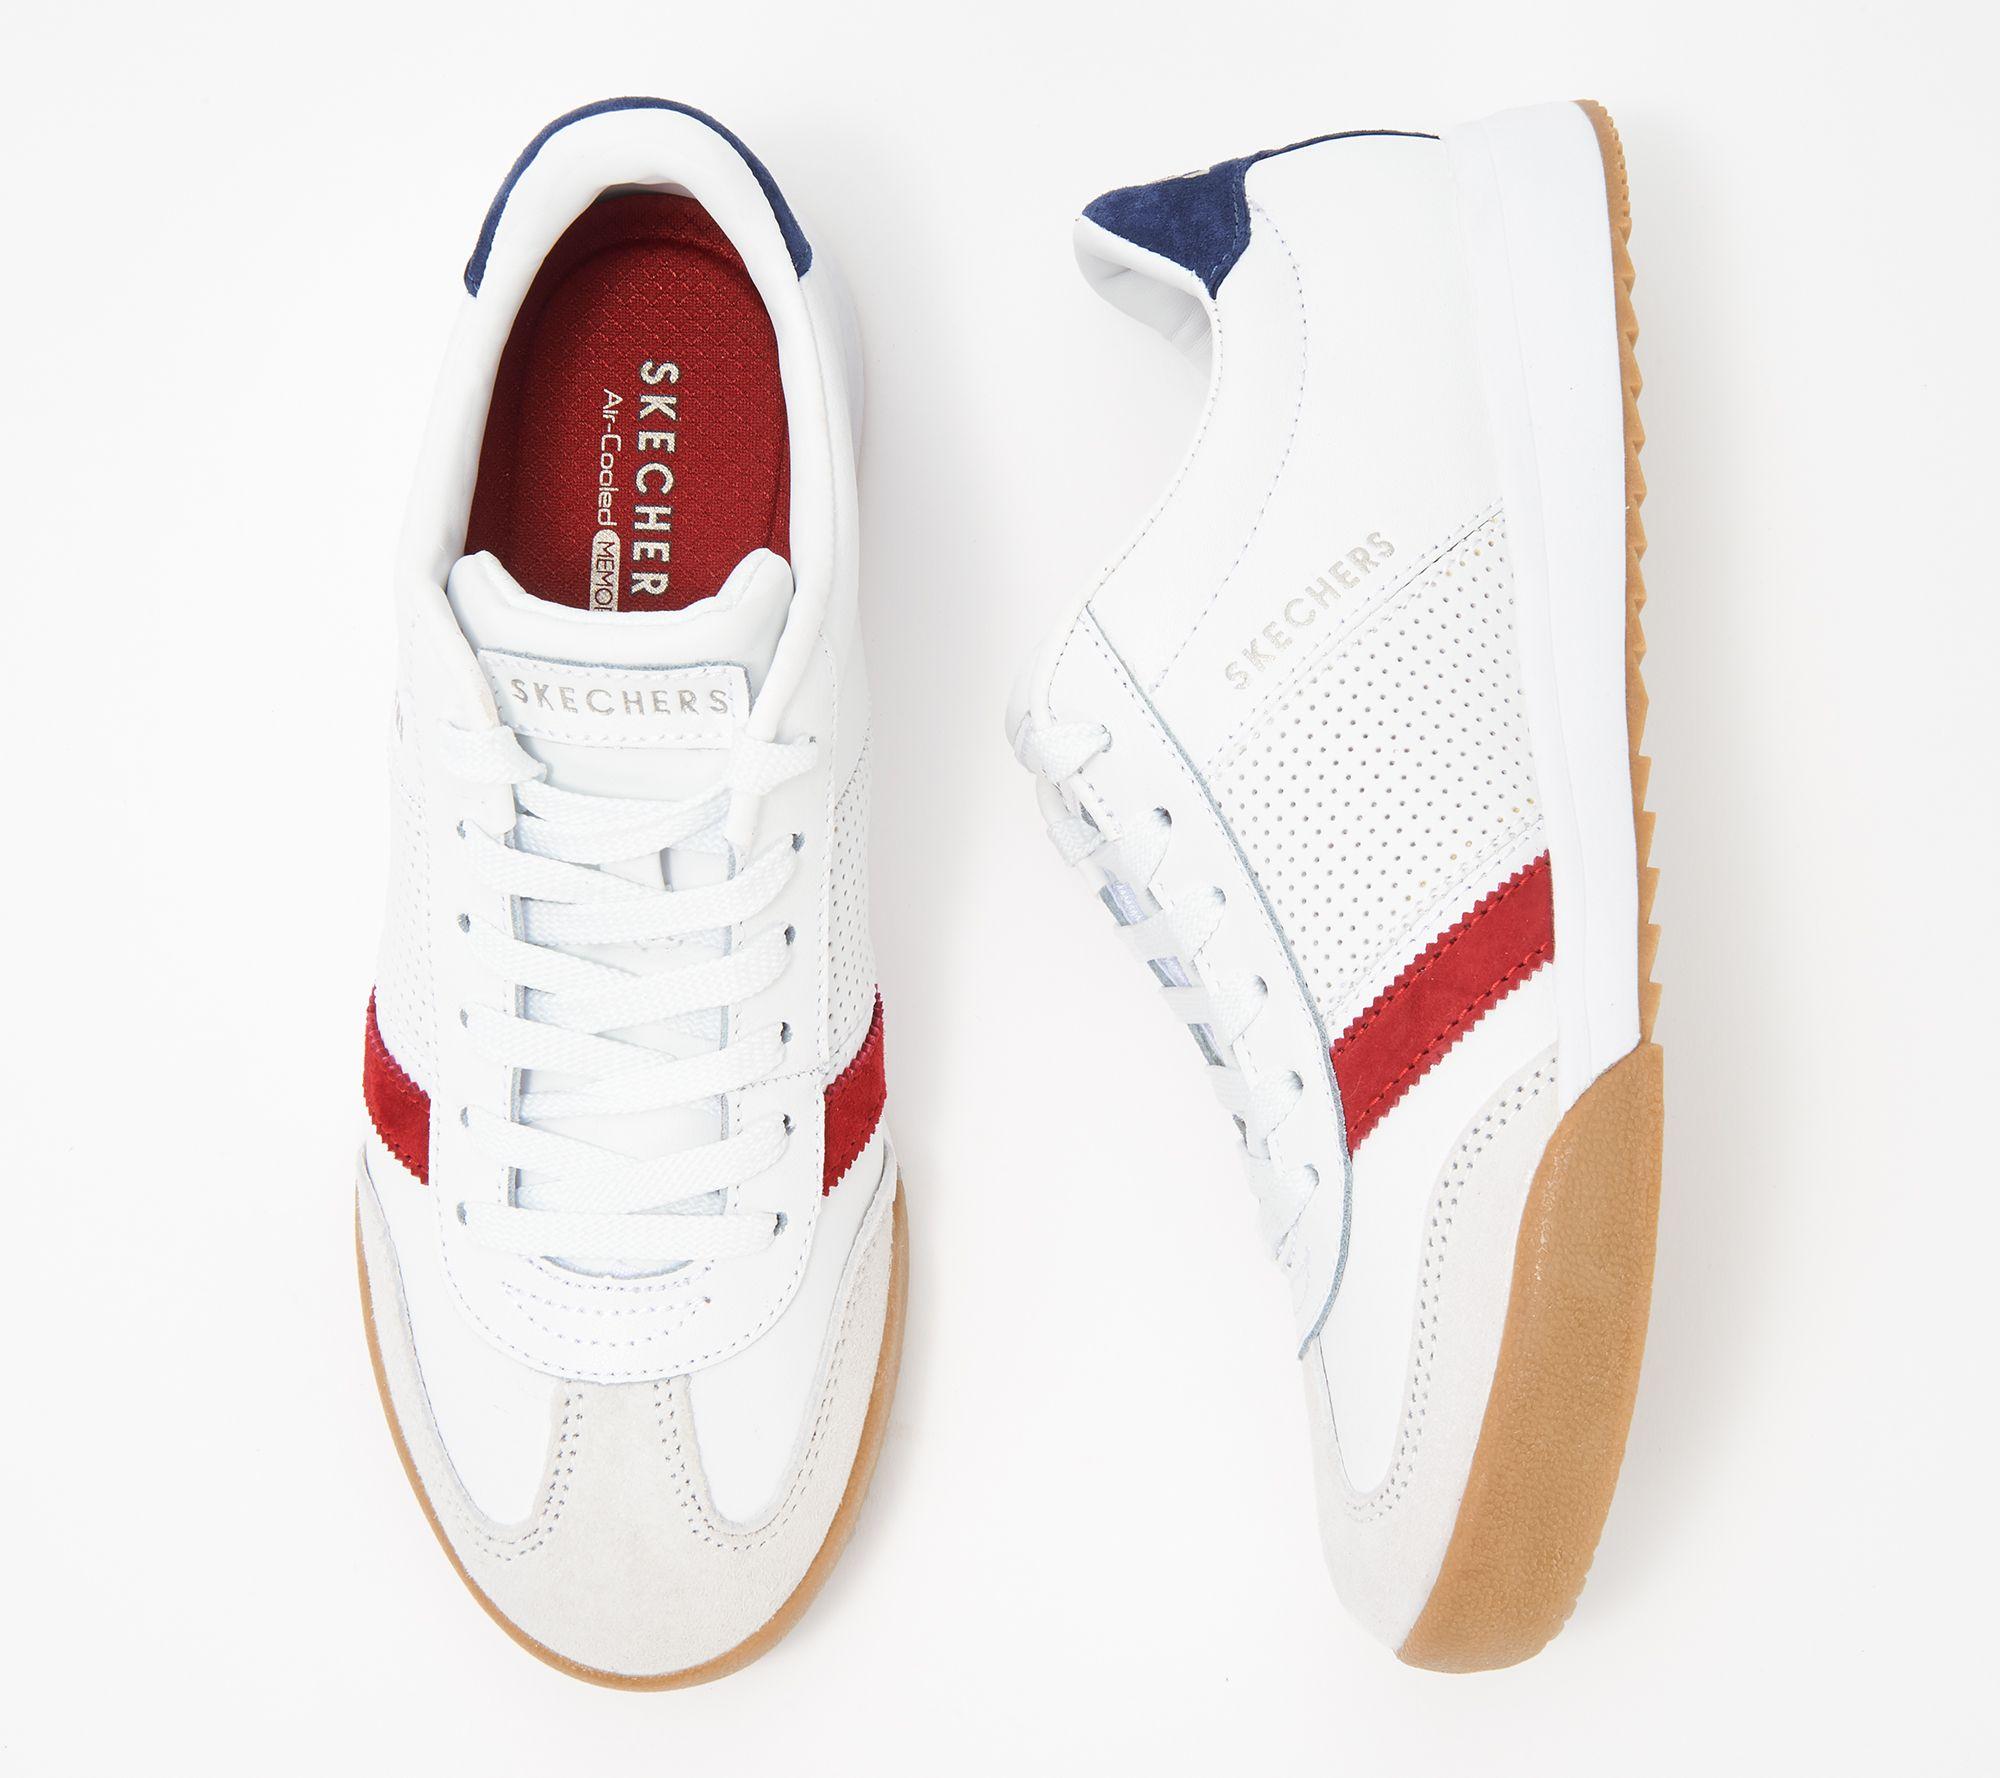 694e9eee874d Skechers Lace-Up Sneakers - Zinger Retro Rockers — QVC.com